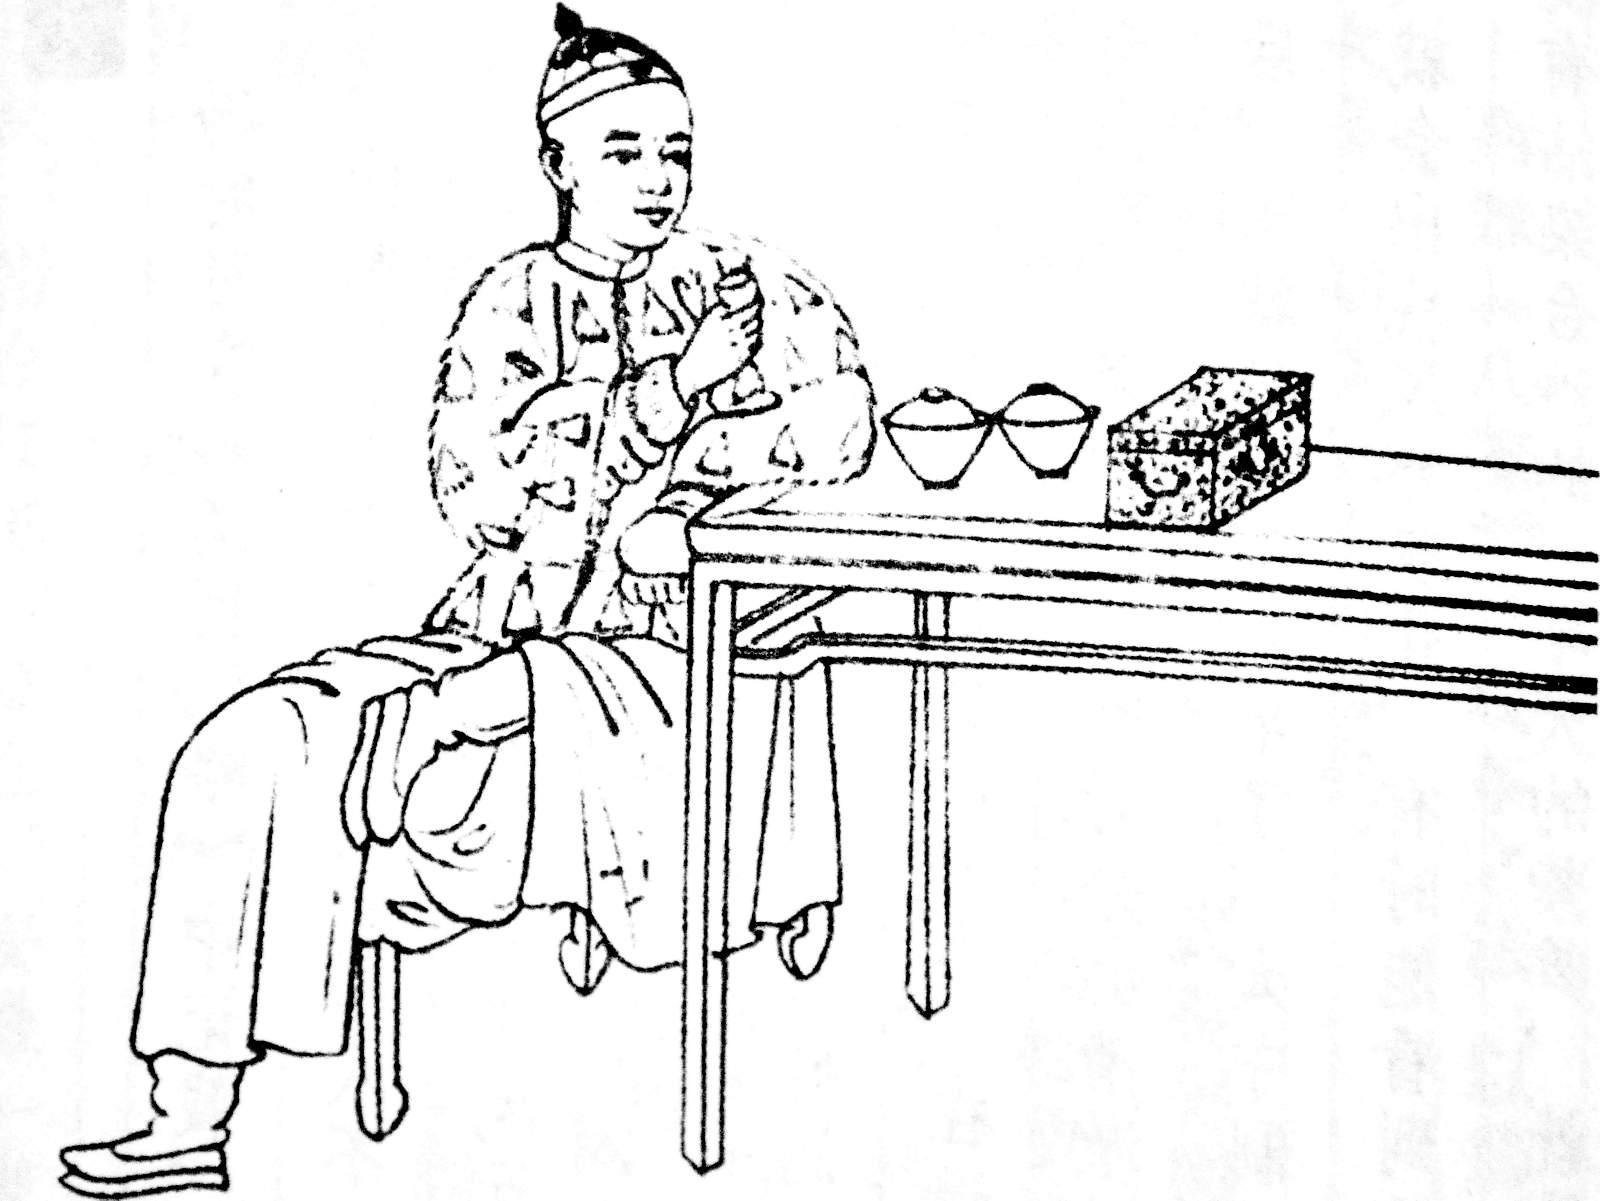 enjoy mature pu-erh tea at an authentic tea table by shopping cha-shifu.com